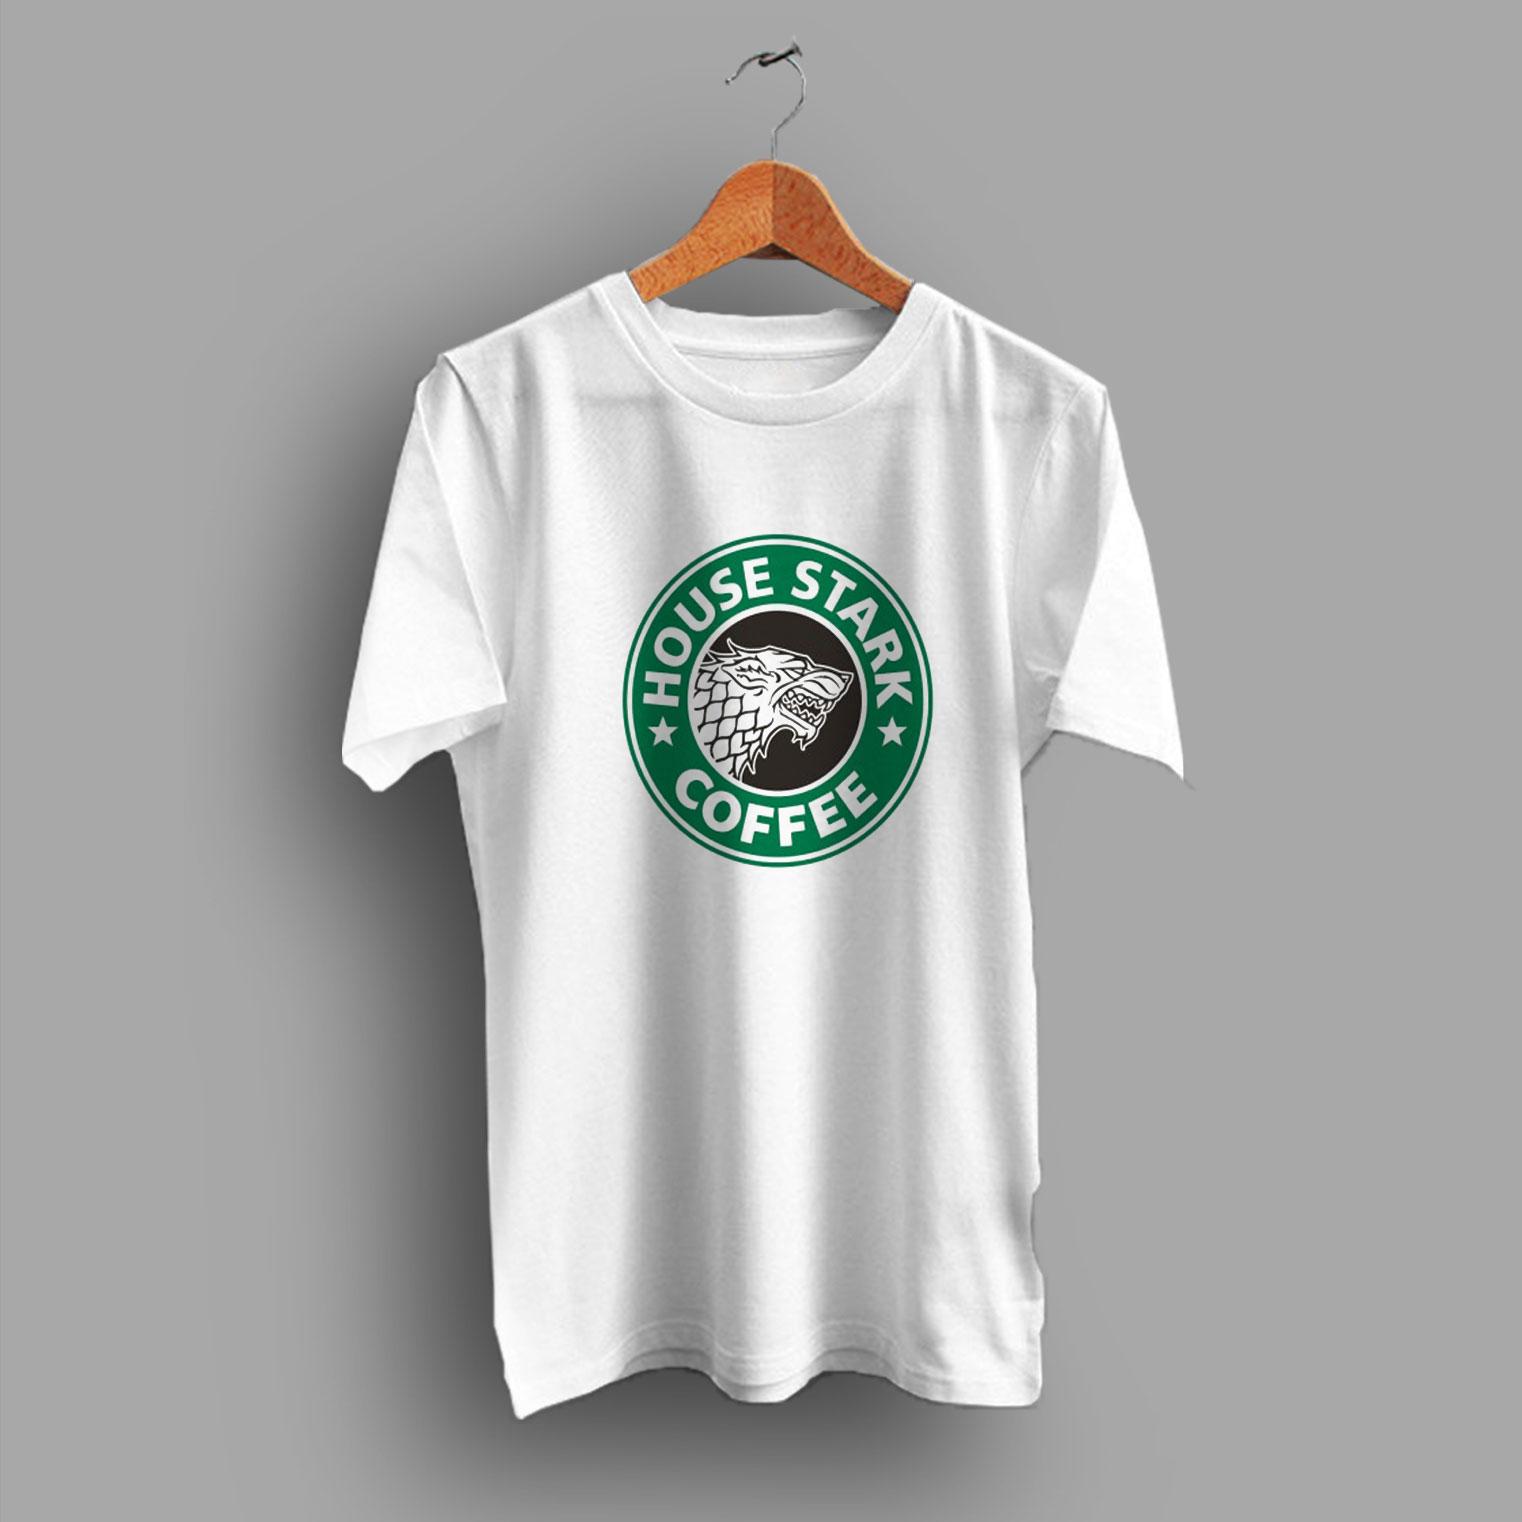 970395ba Buy House Stark Coffee Game Of Thrones Family T Shirt - HotVero